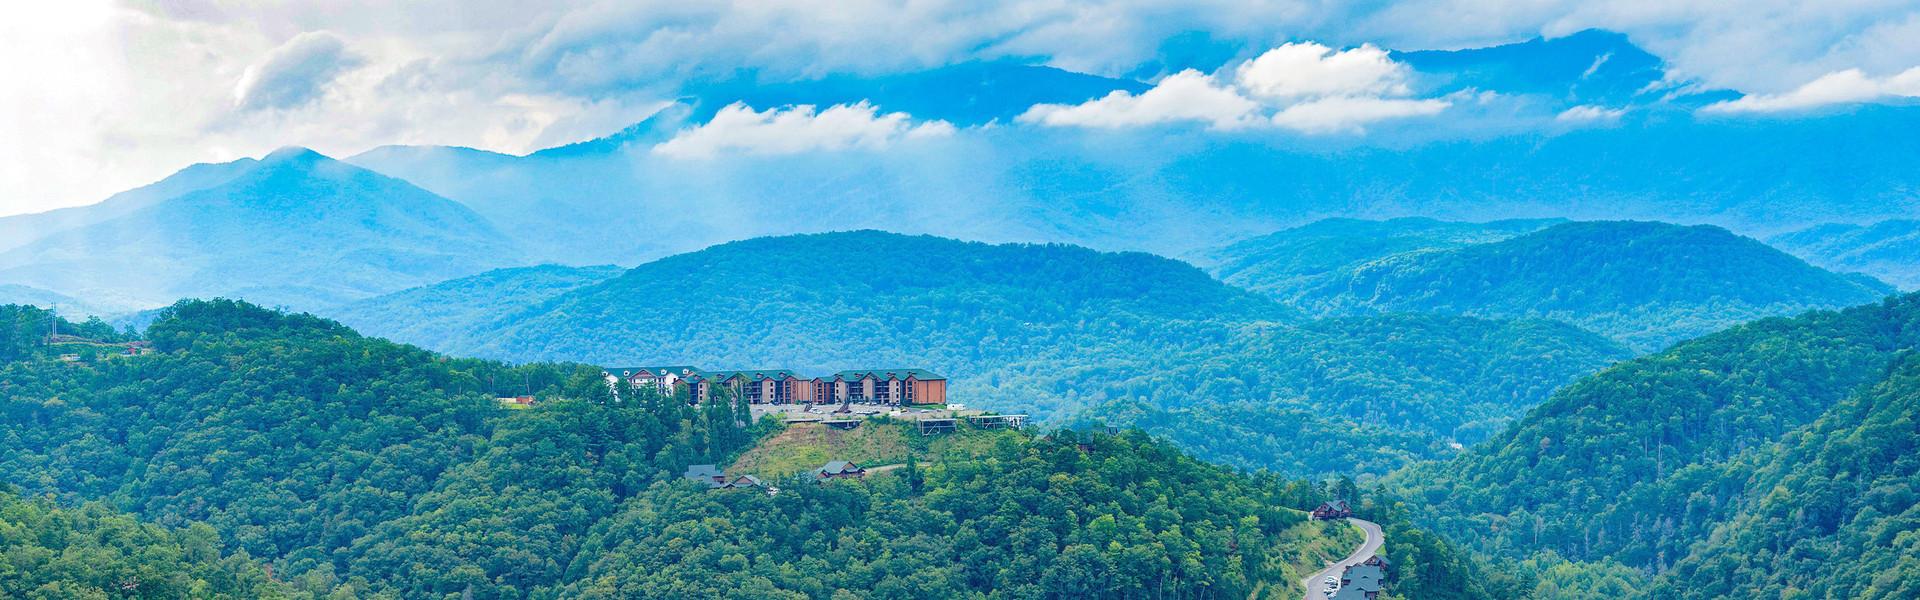 Gatlinburg Tennessee Resort Overview | Westgate Smoky Mountain